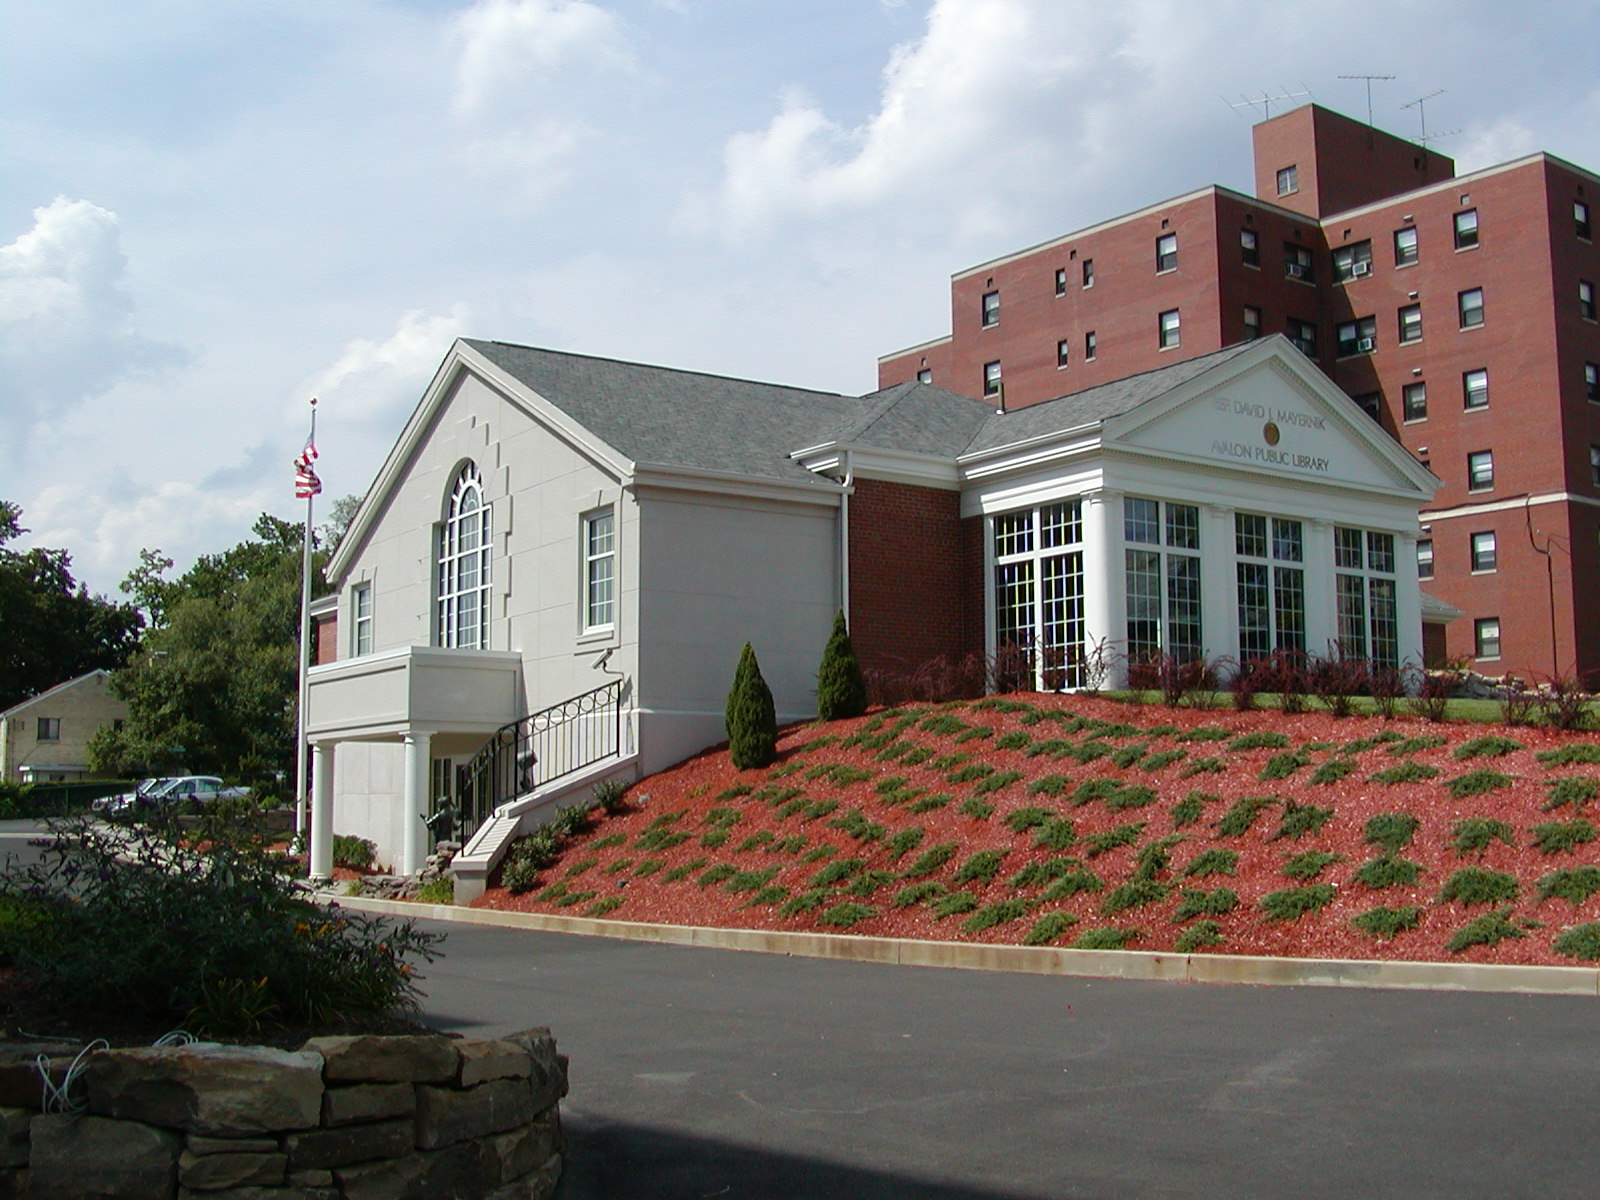 Avalon Public Library, Avalon, PA